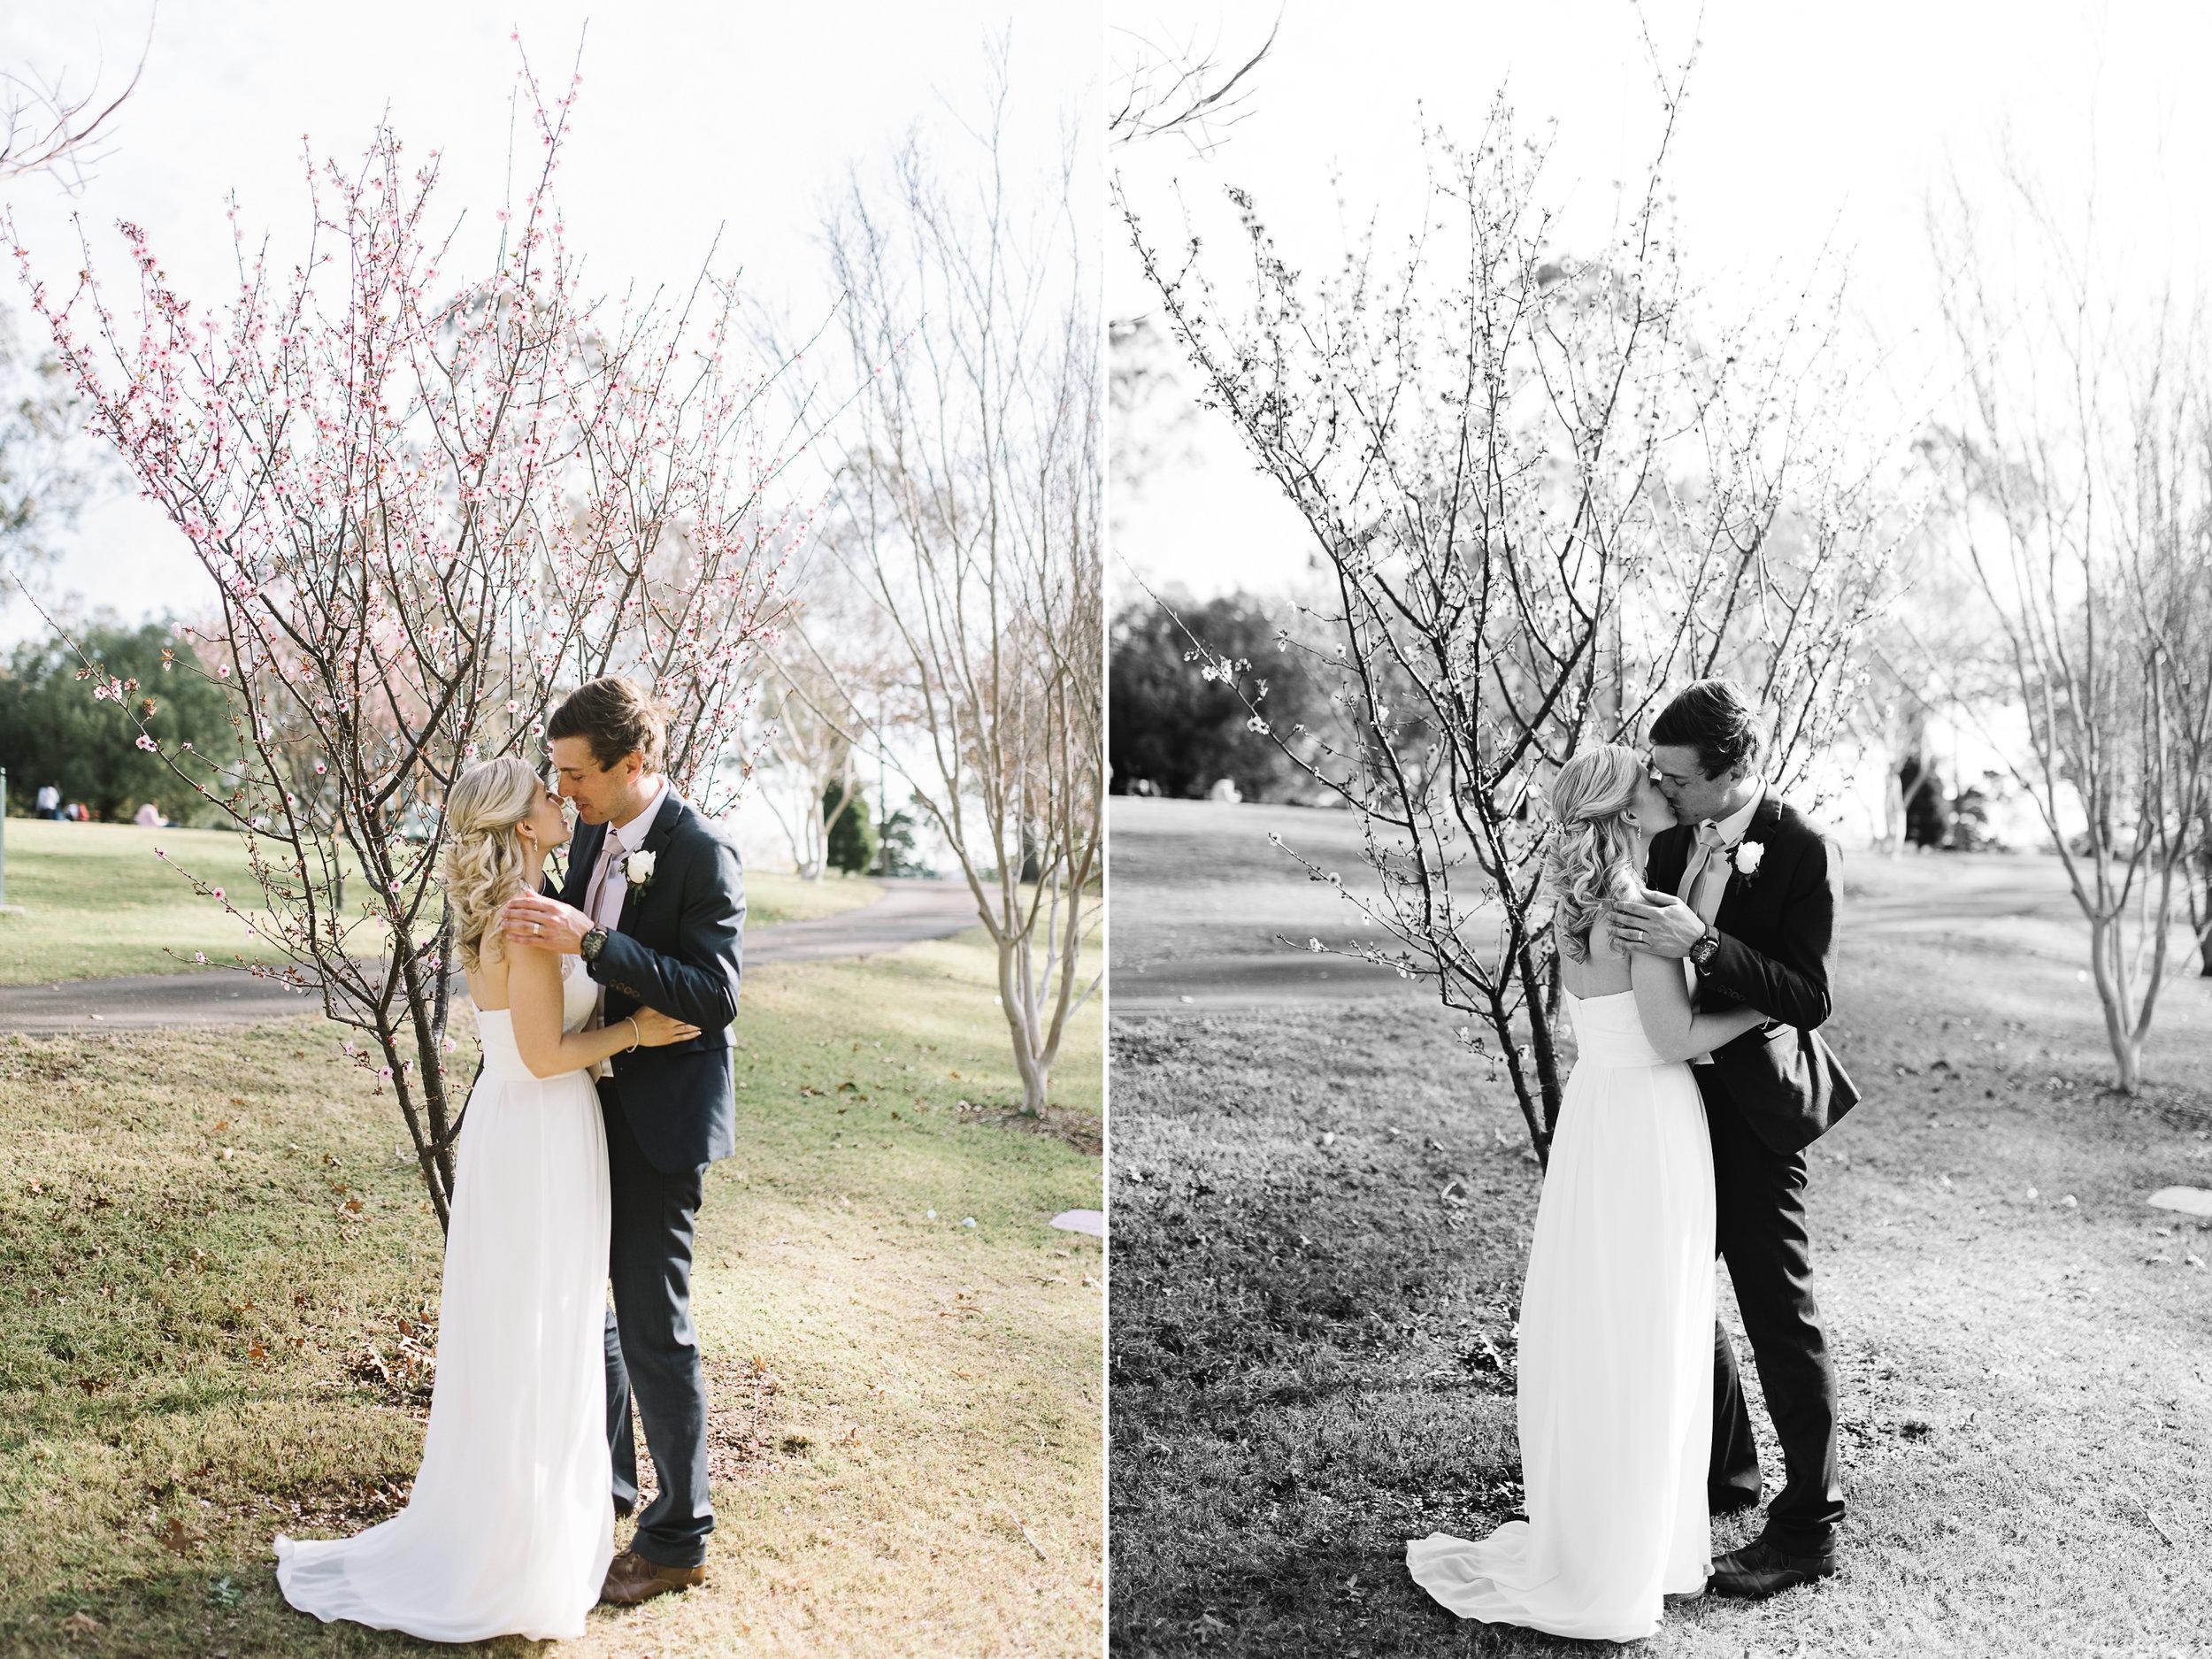 sydney-wedding-photographer-7.jpg